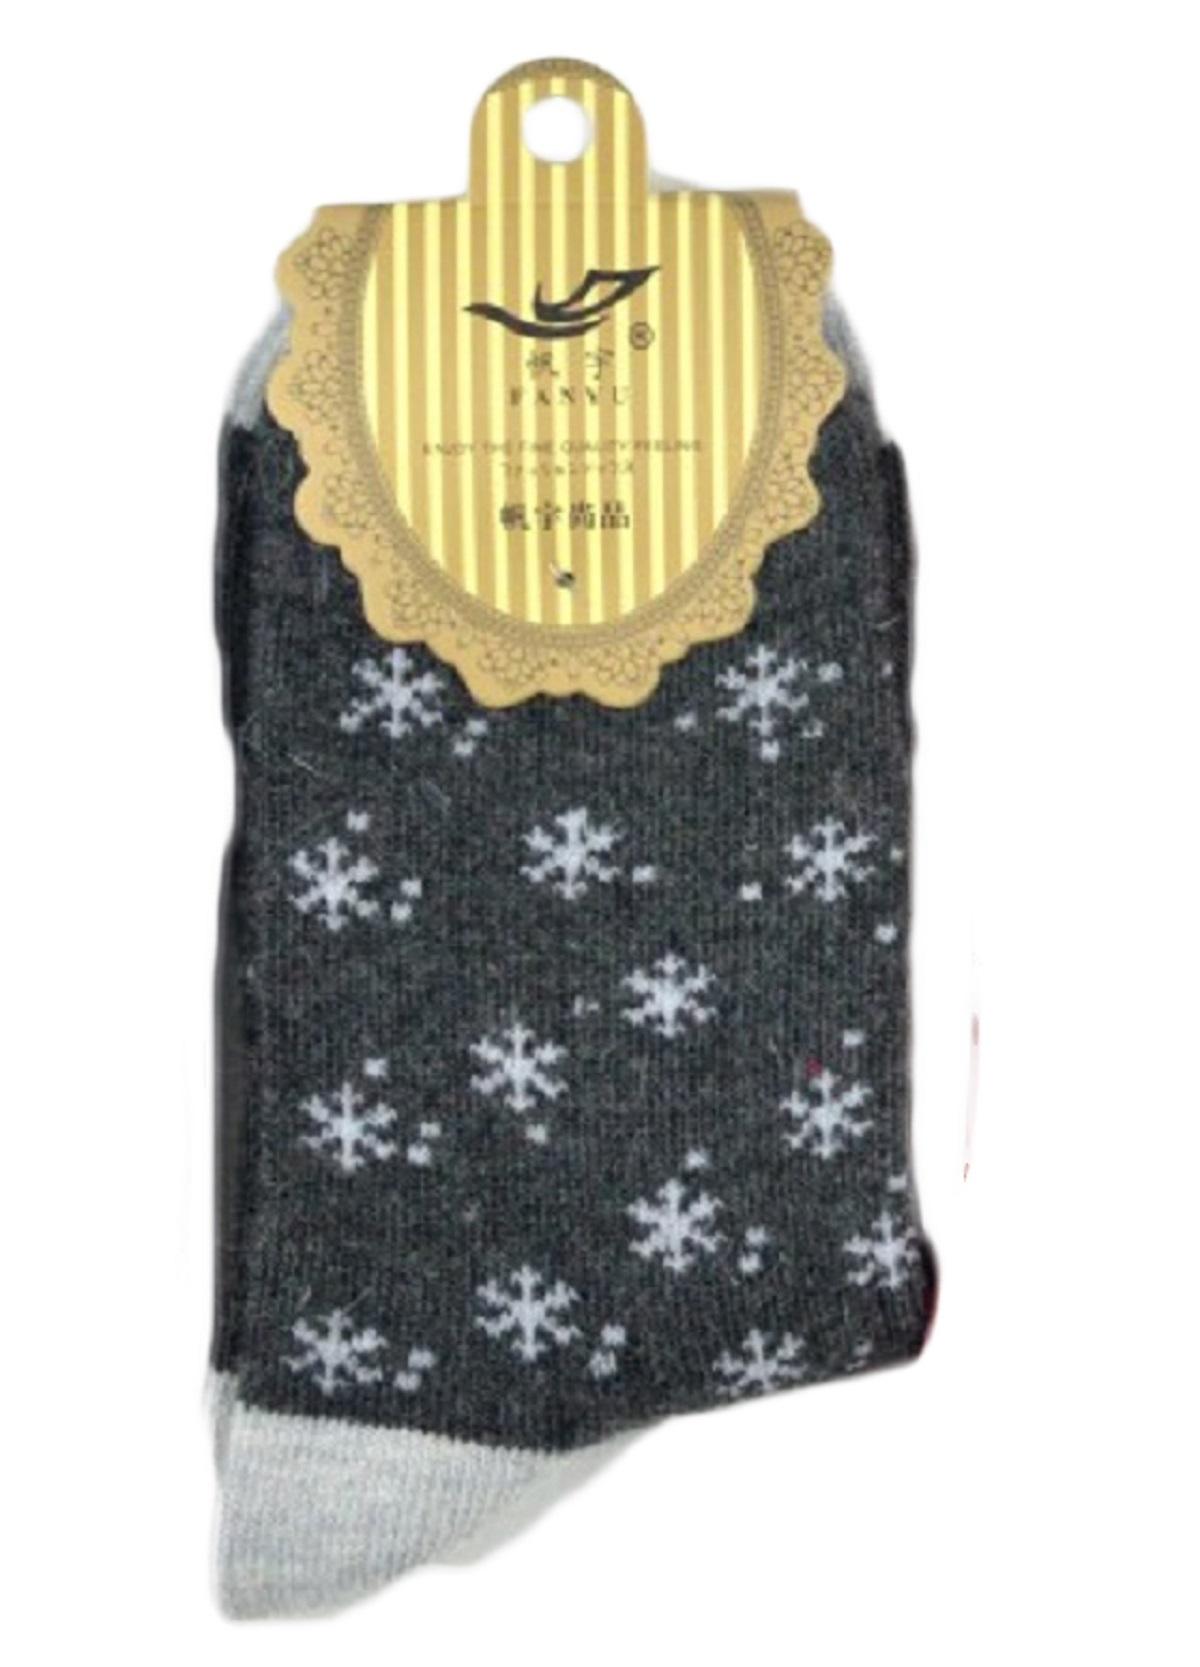 Lian Style 6 Pairs Big Girl's Angora Lambs Wool Socks Snowflakes Size L Casual(Beige)